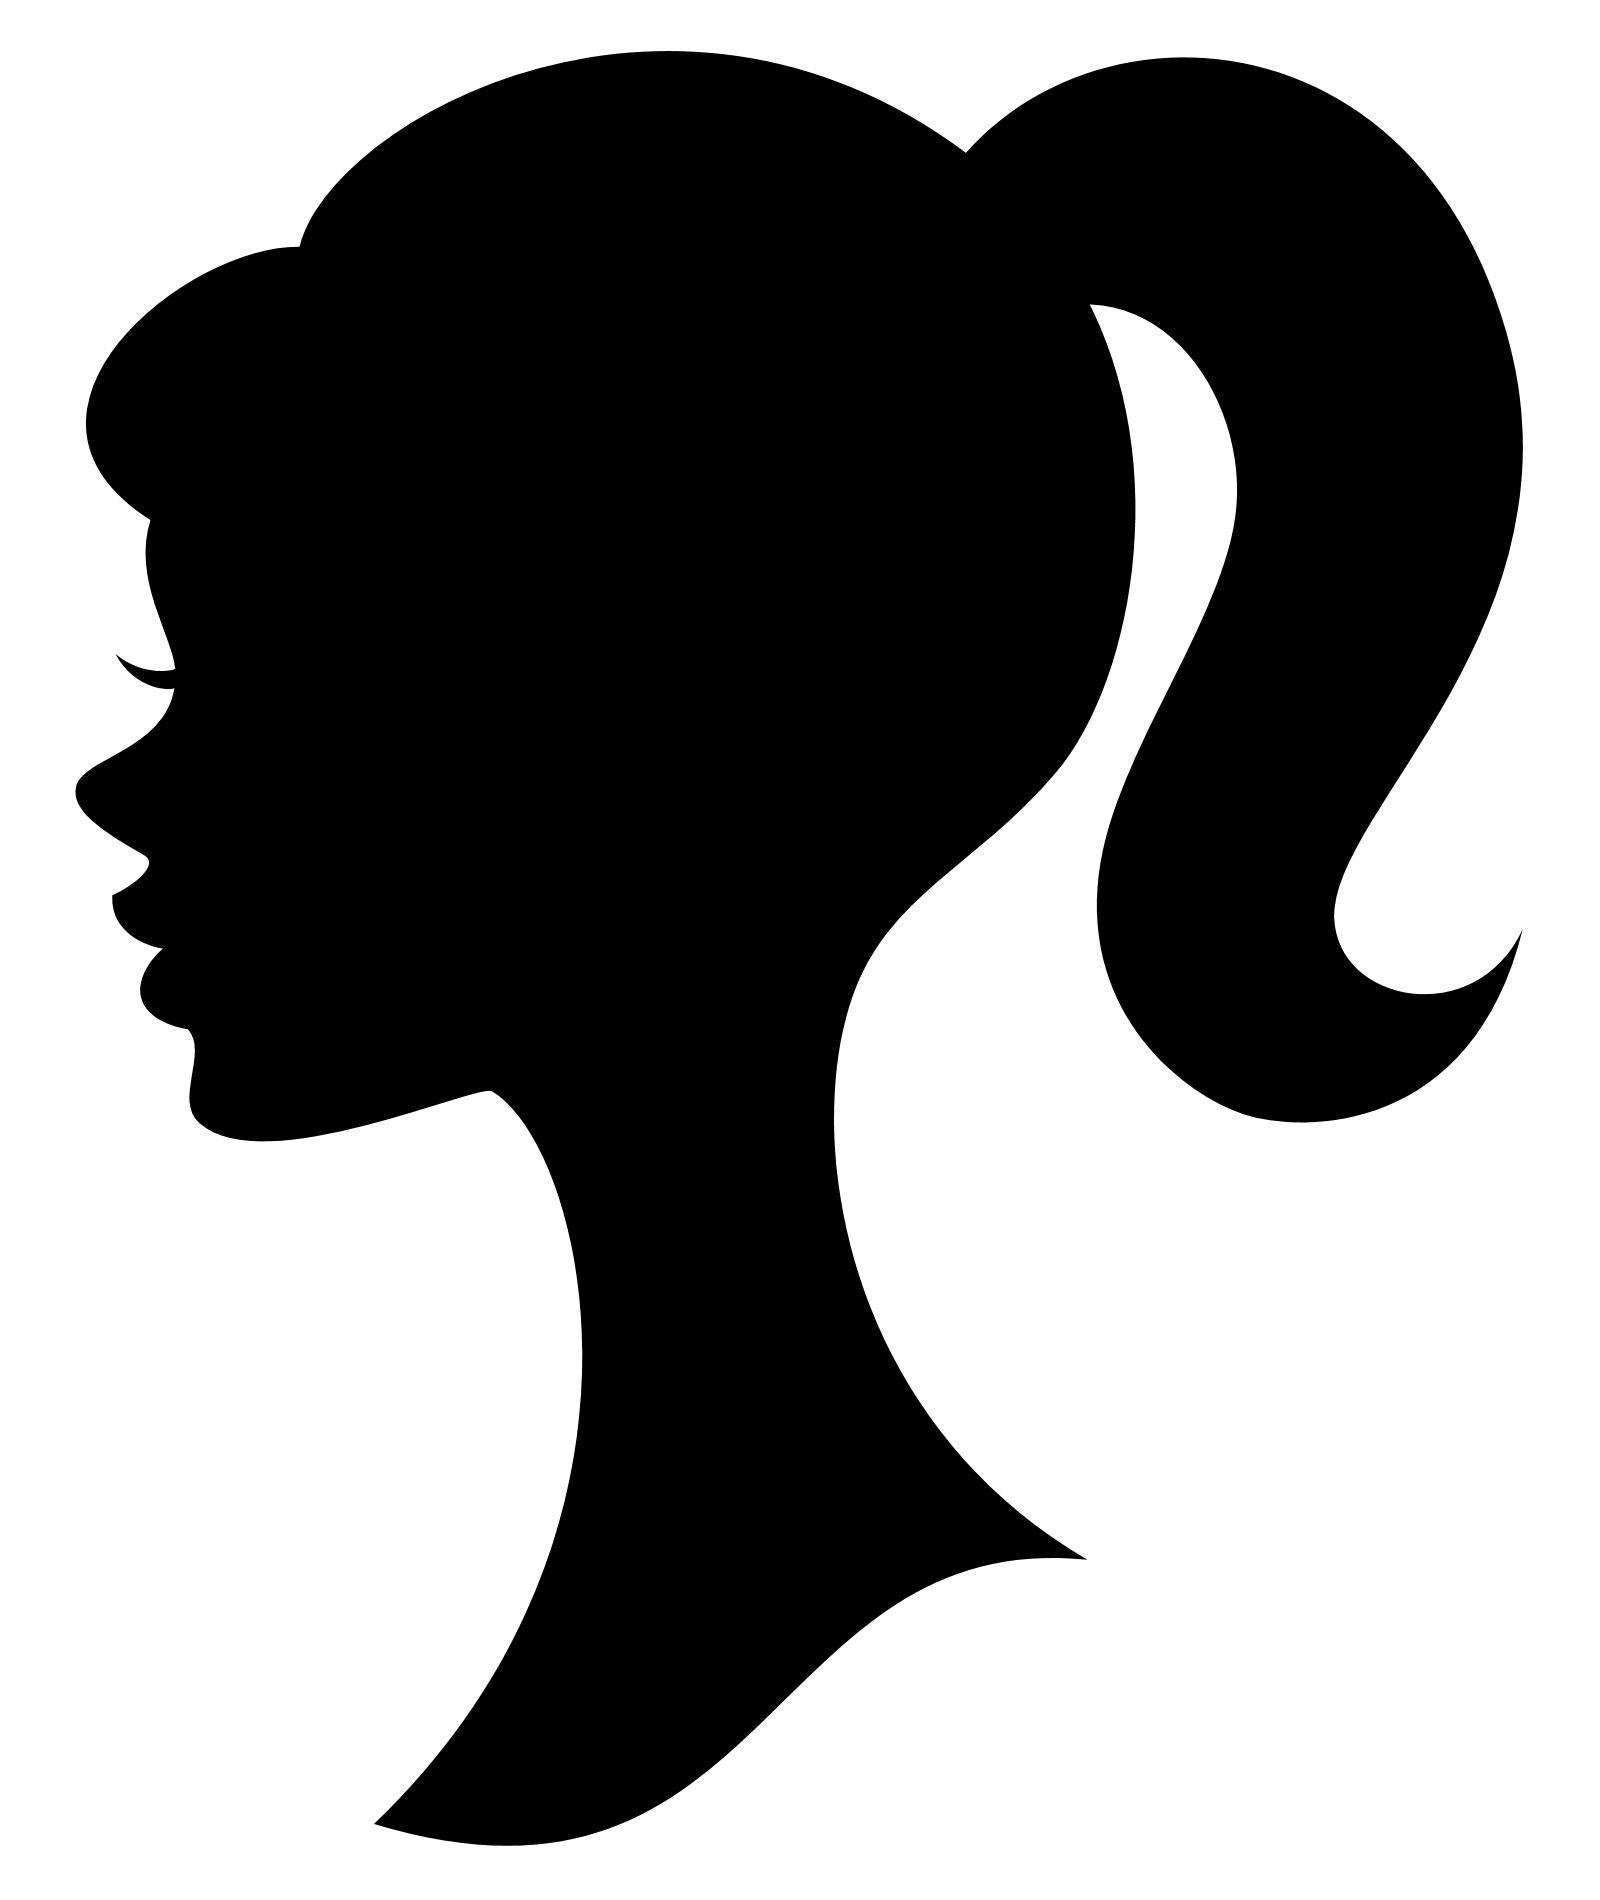 1600x1900 Barbie Princess Movies Images Barbie Silhouette Hd Wallpaper